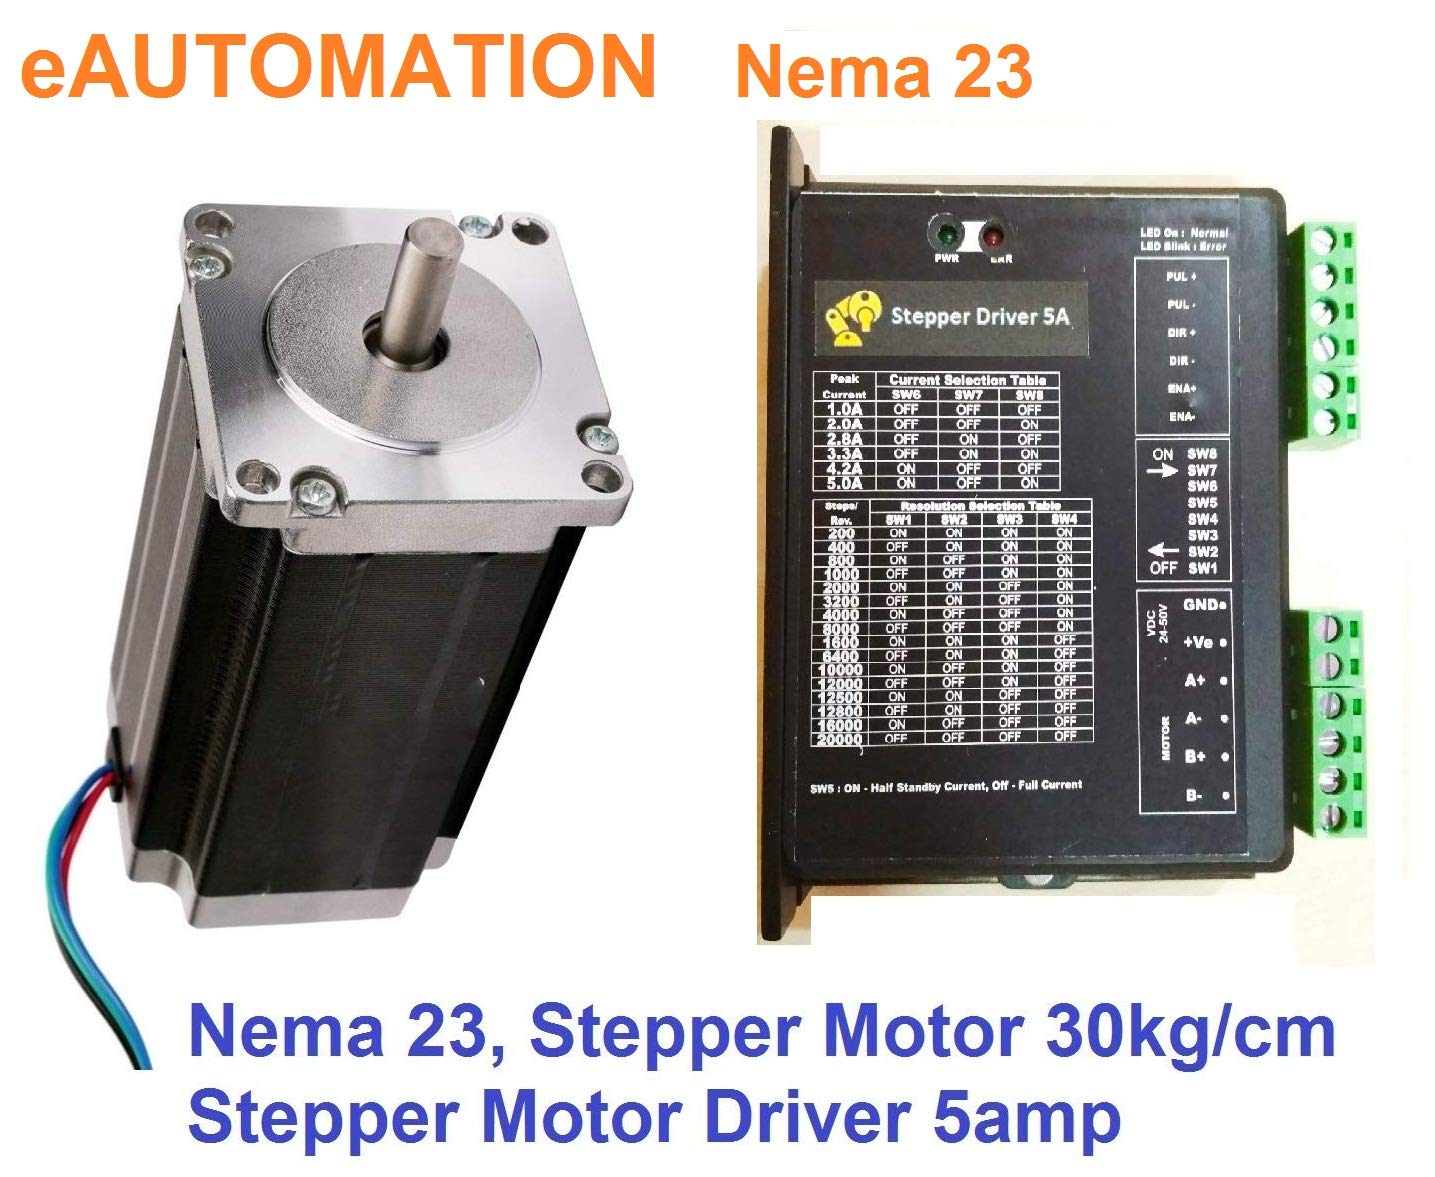 Eautomation Nema 23 Stepper Motor 30kg Cm With Stepper Driver 5amp Kit 1set Bipolar Hybrid Amazon In Industrial Scientific